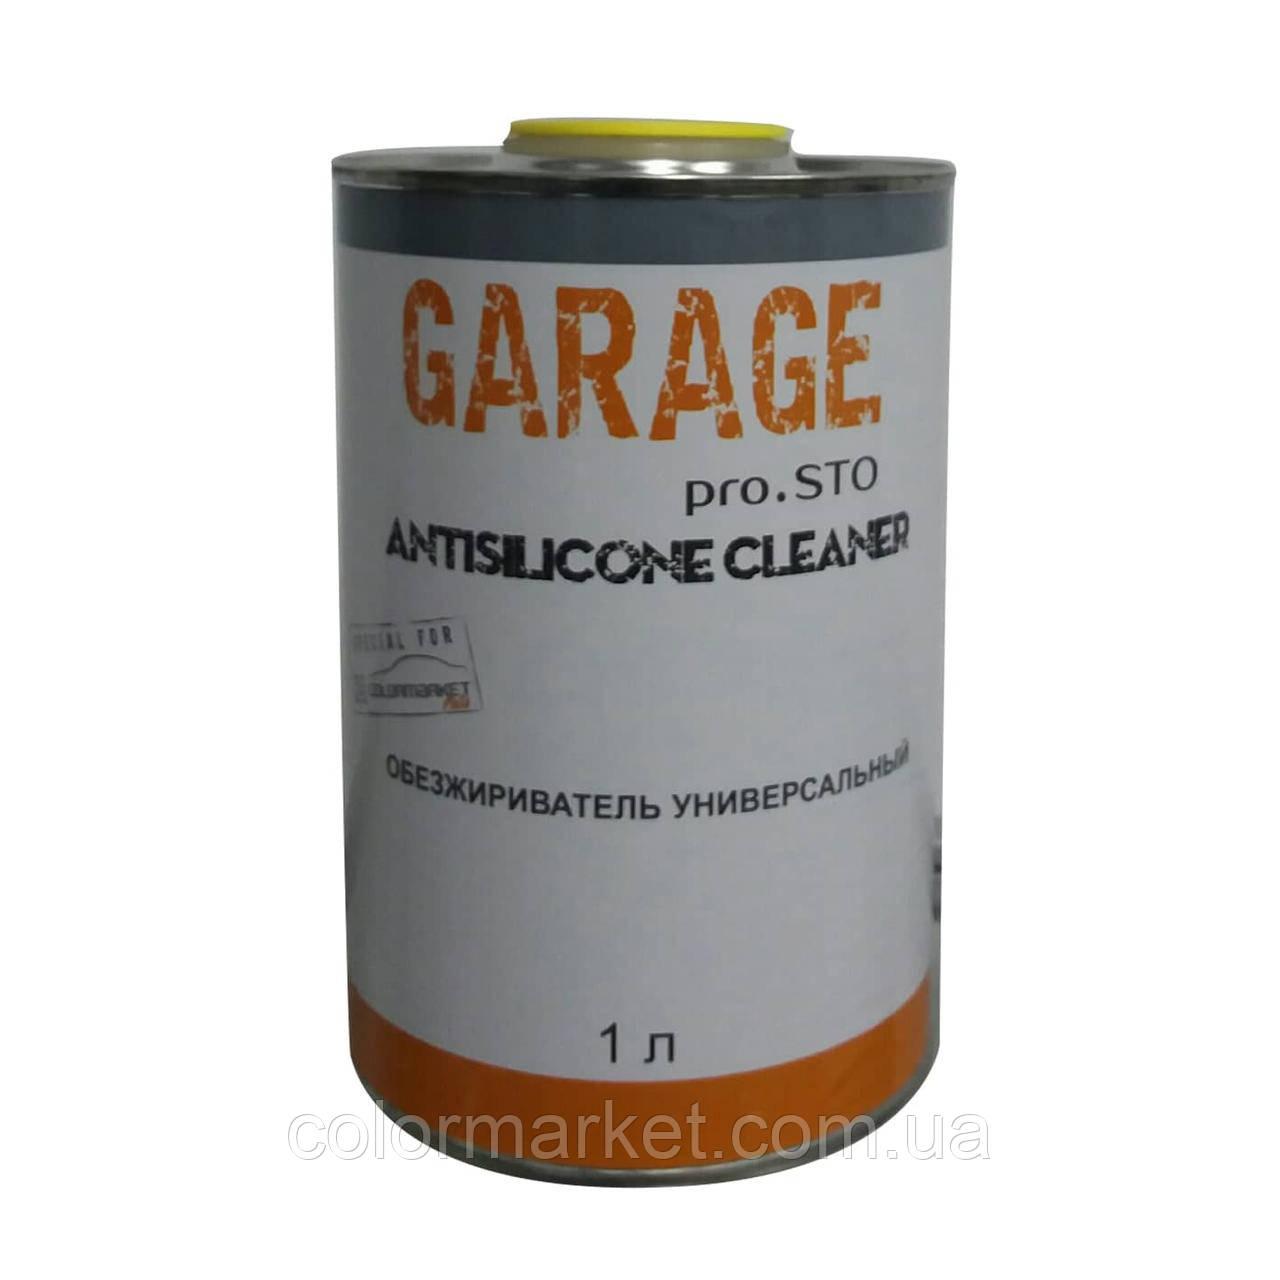 Знежирювачах універсальний Antisilicone Cleaner (1 л), GARAGE